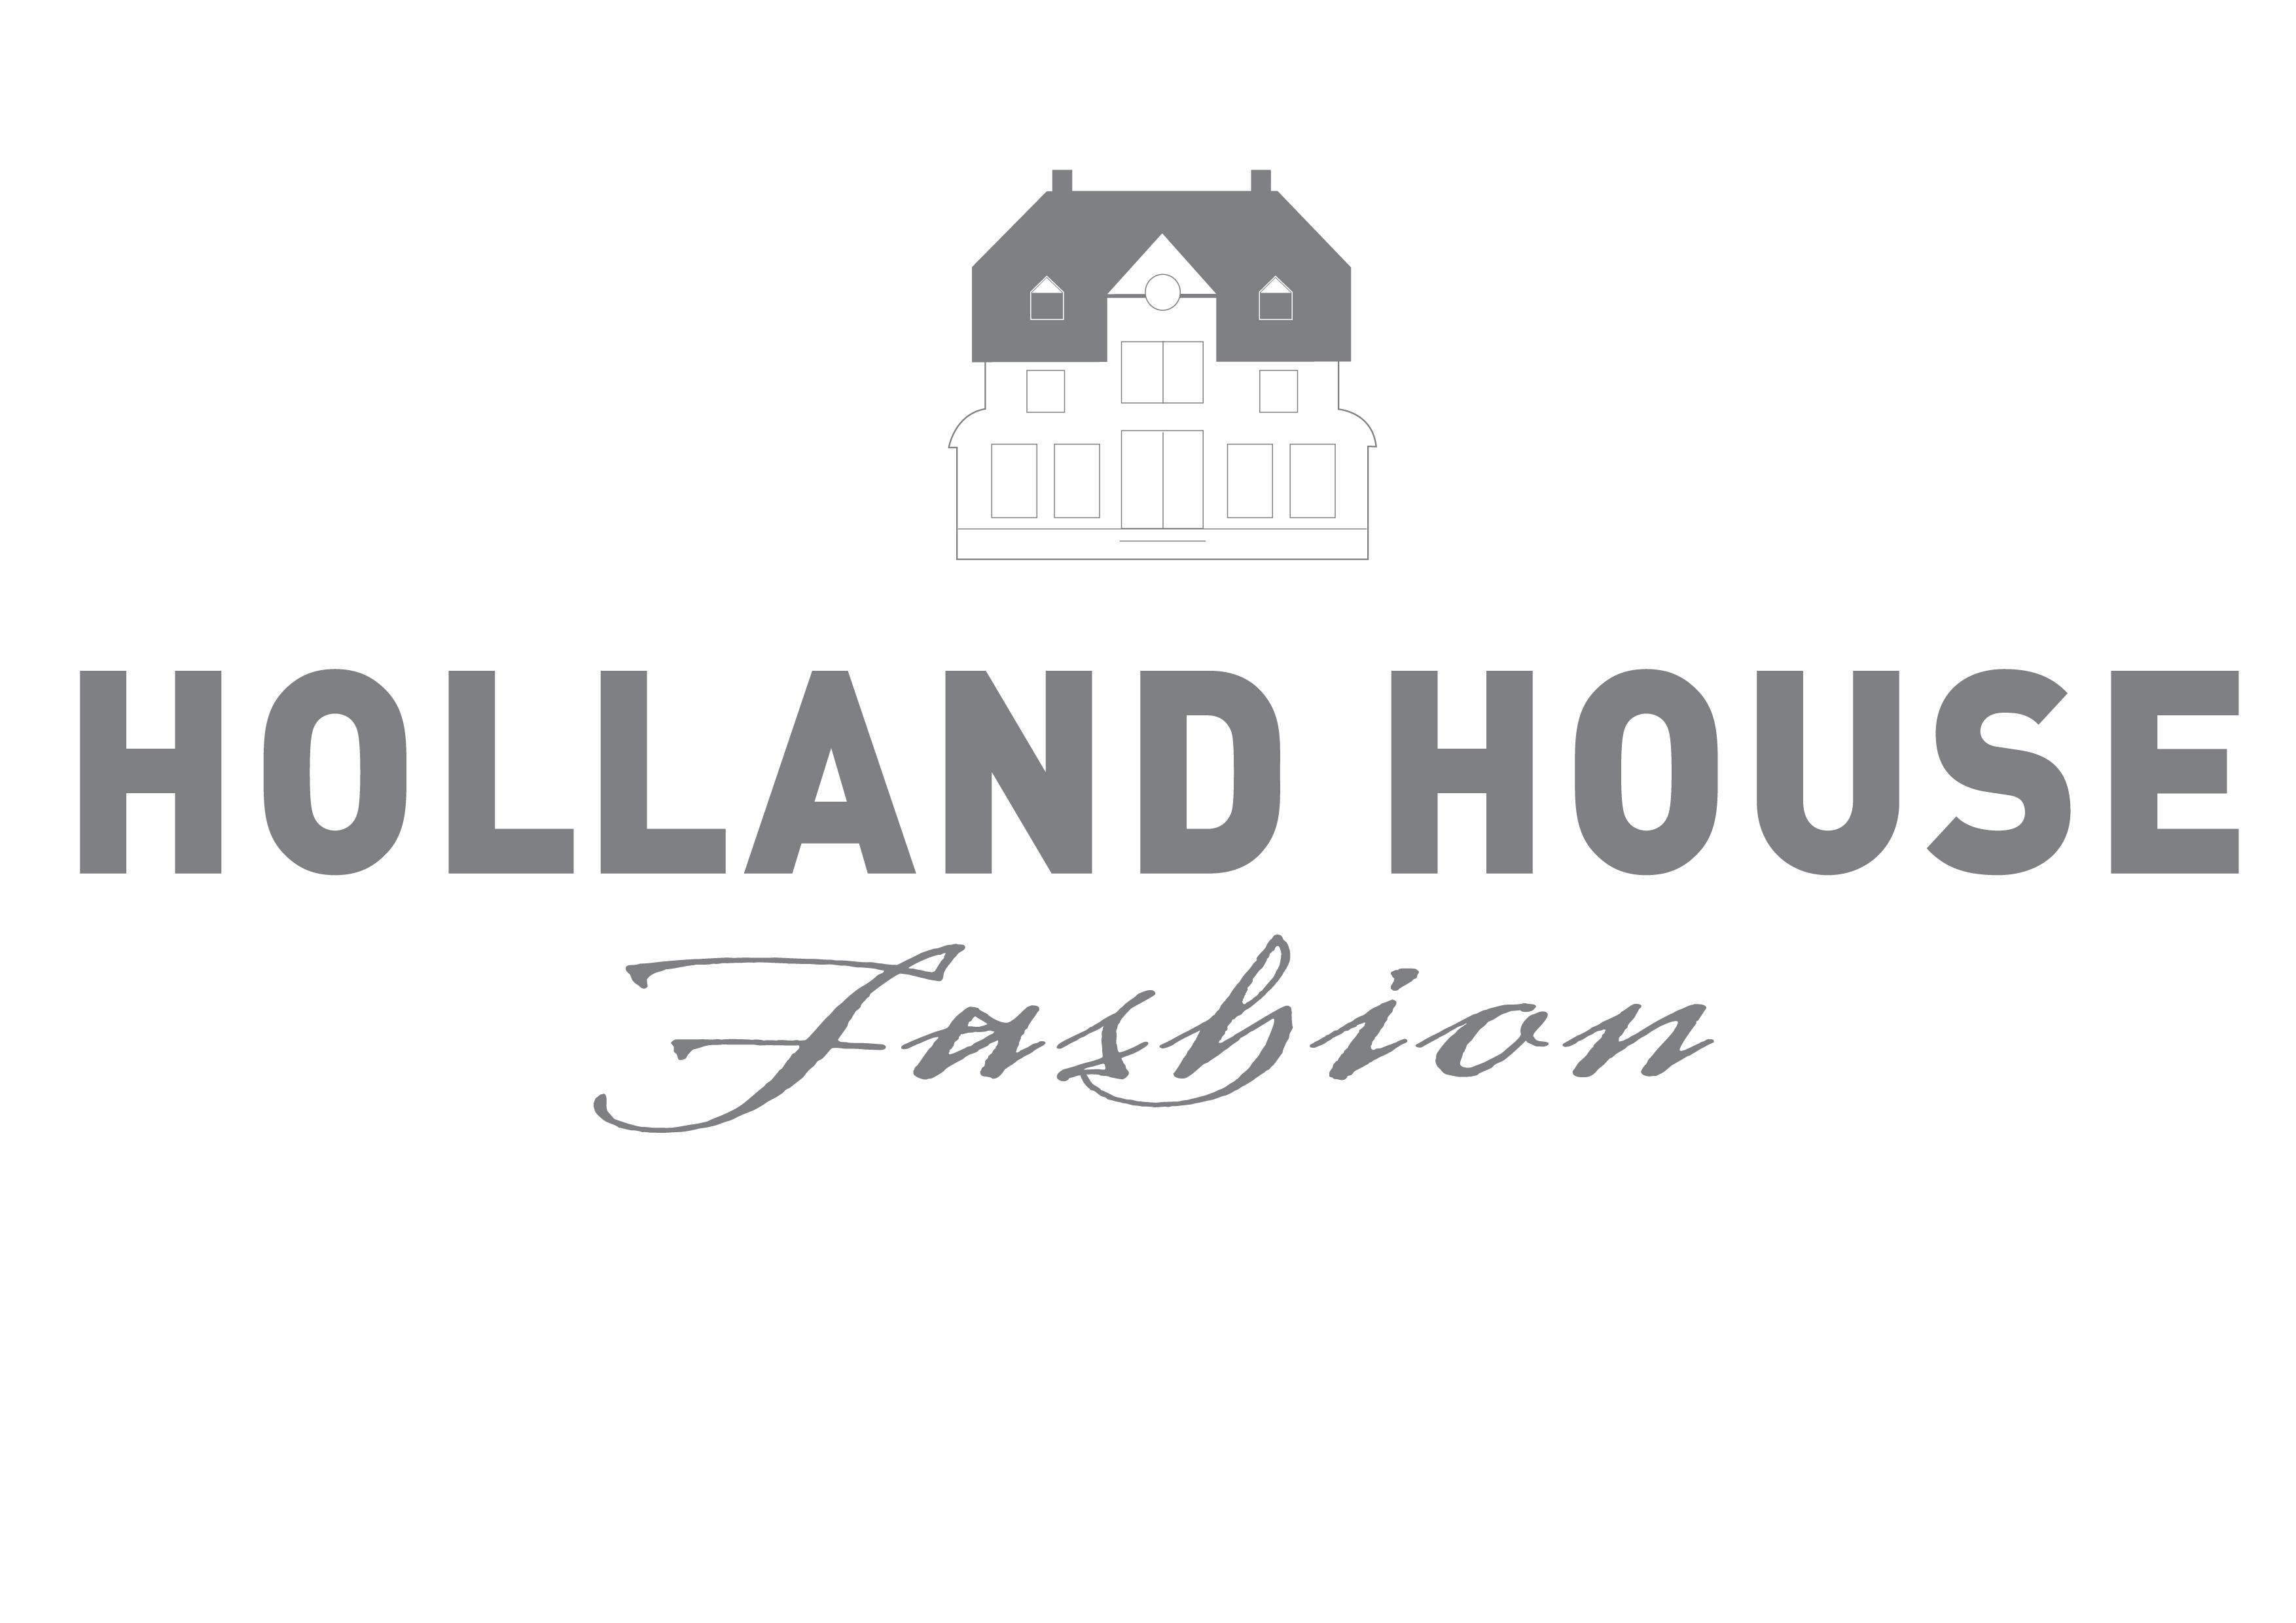 Holland house B.V